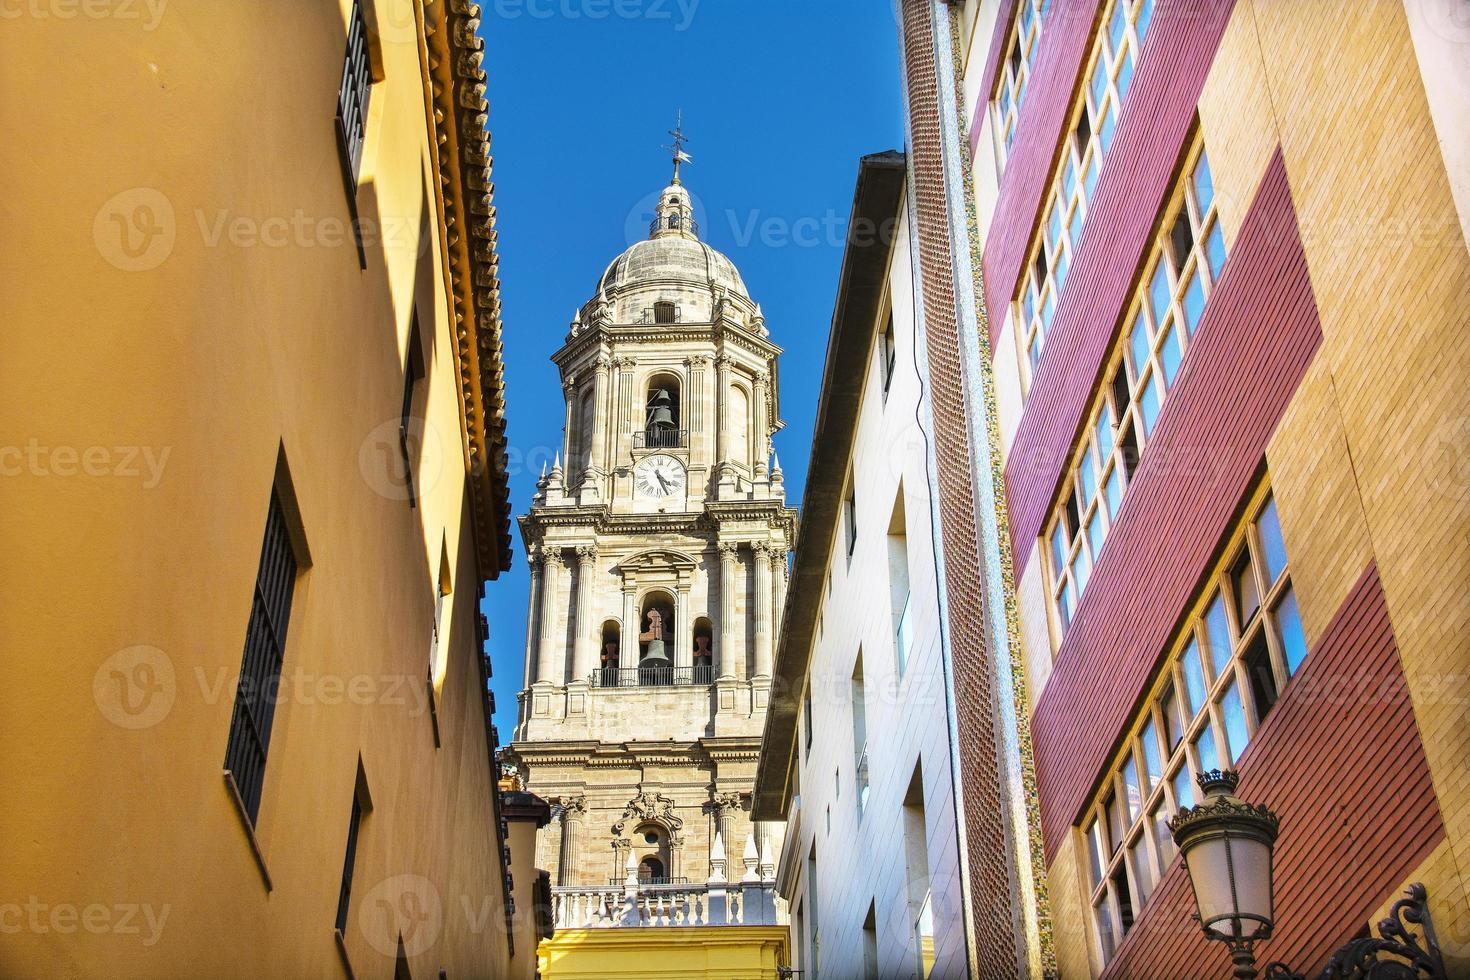 kathedraal van Malaga van steegje foto